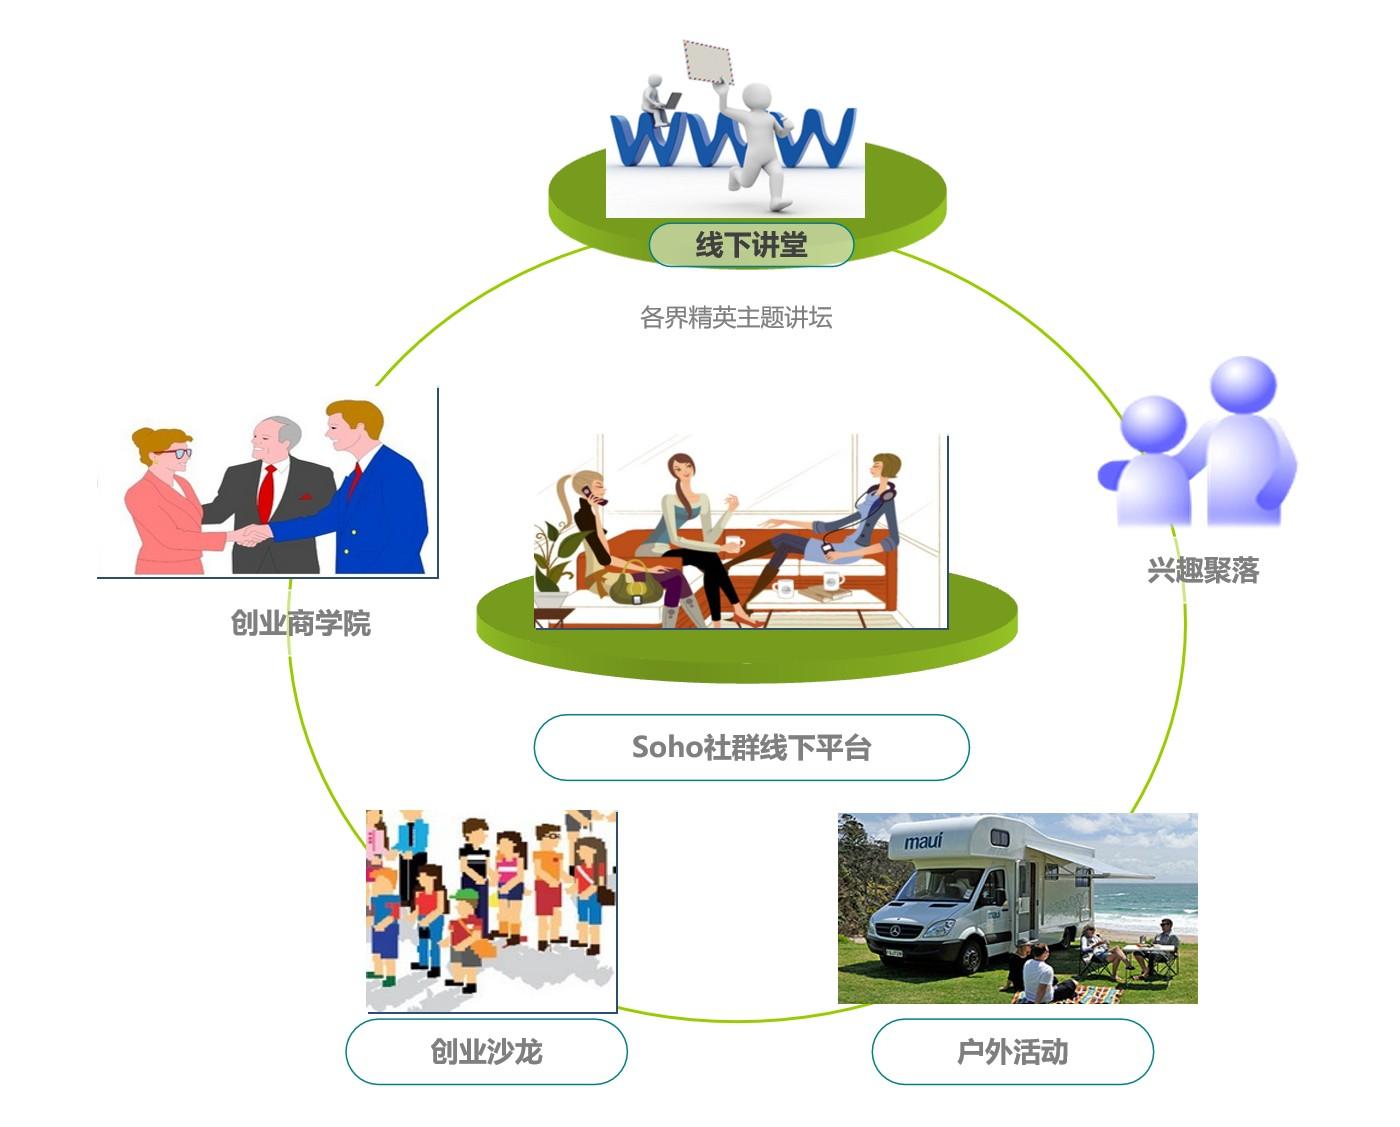 潘苹果<a href='http://www.6chuangyi.com/' title='' style='color:;font-weight:bold'>品牌策划</a>22.jpg